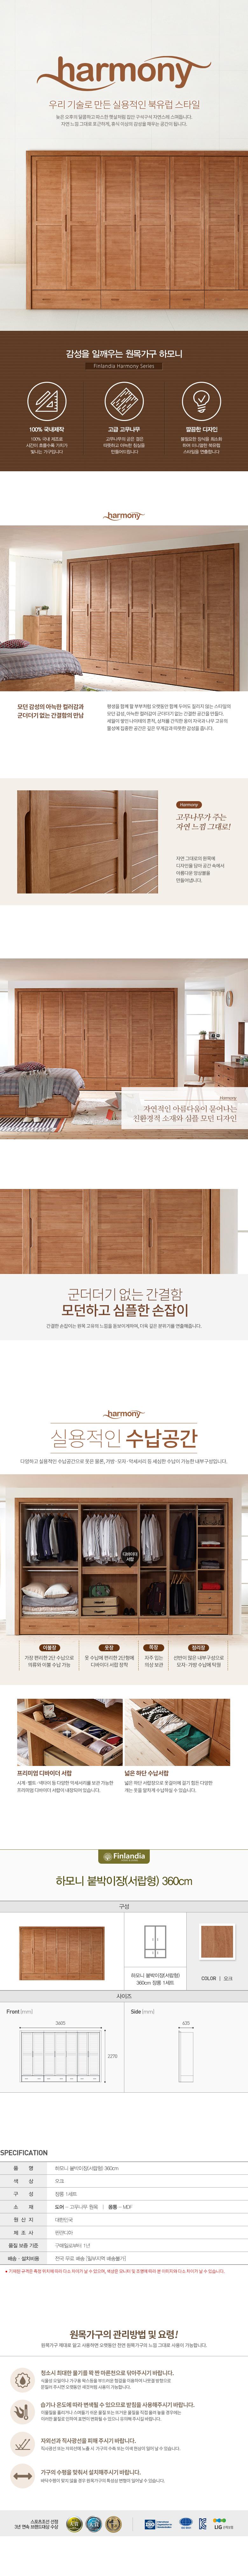 harmony_closet360.jpg